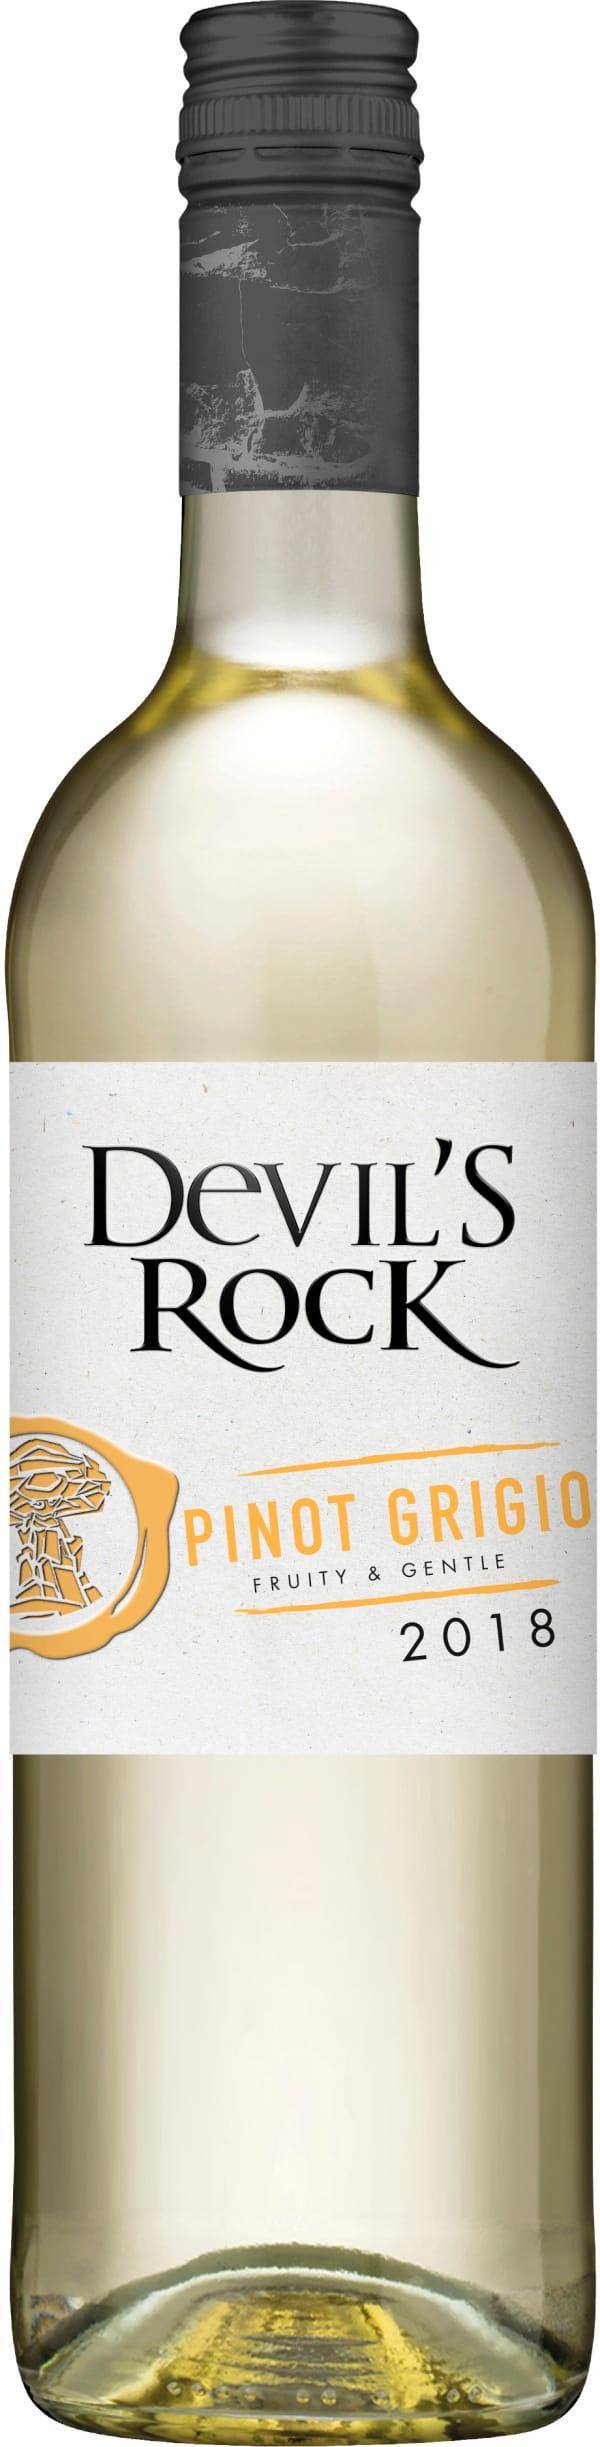 Devil's Rock Pinot Grigio 2018